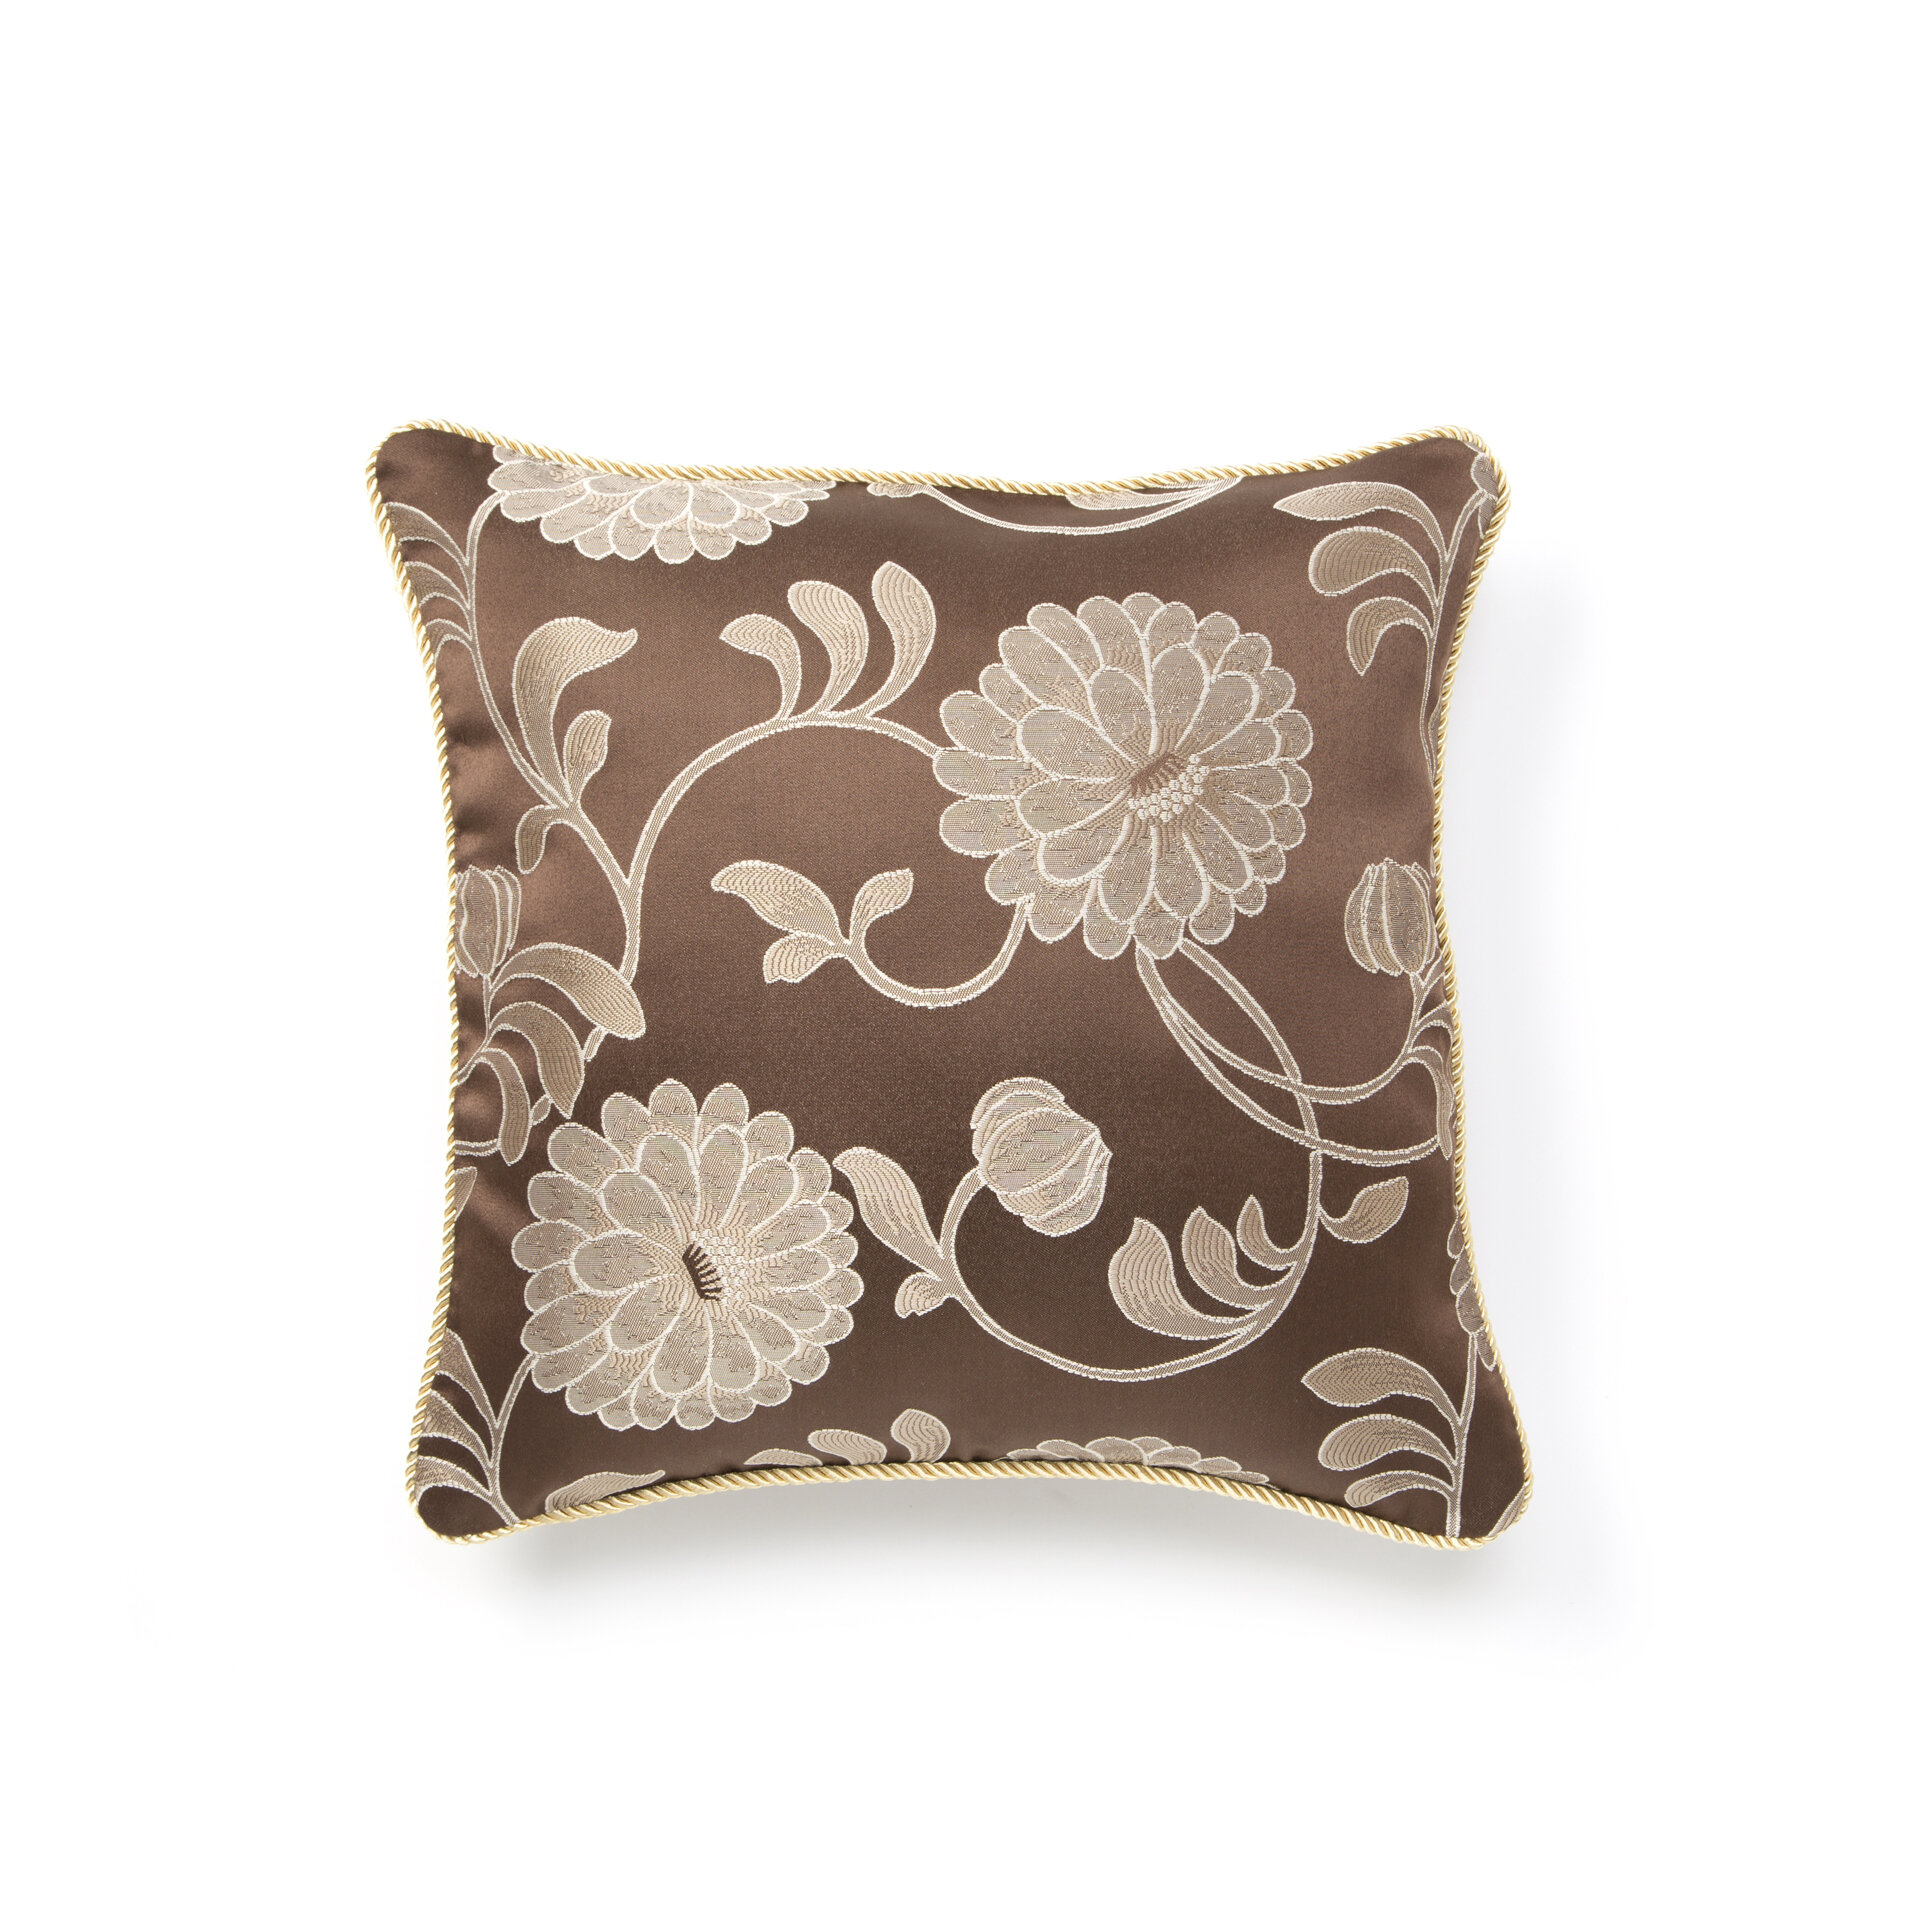 Charlton Home Wieland Decorative Floral Flower 18 Throw Pillow Cover Reviews Wayfair